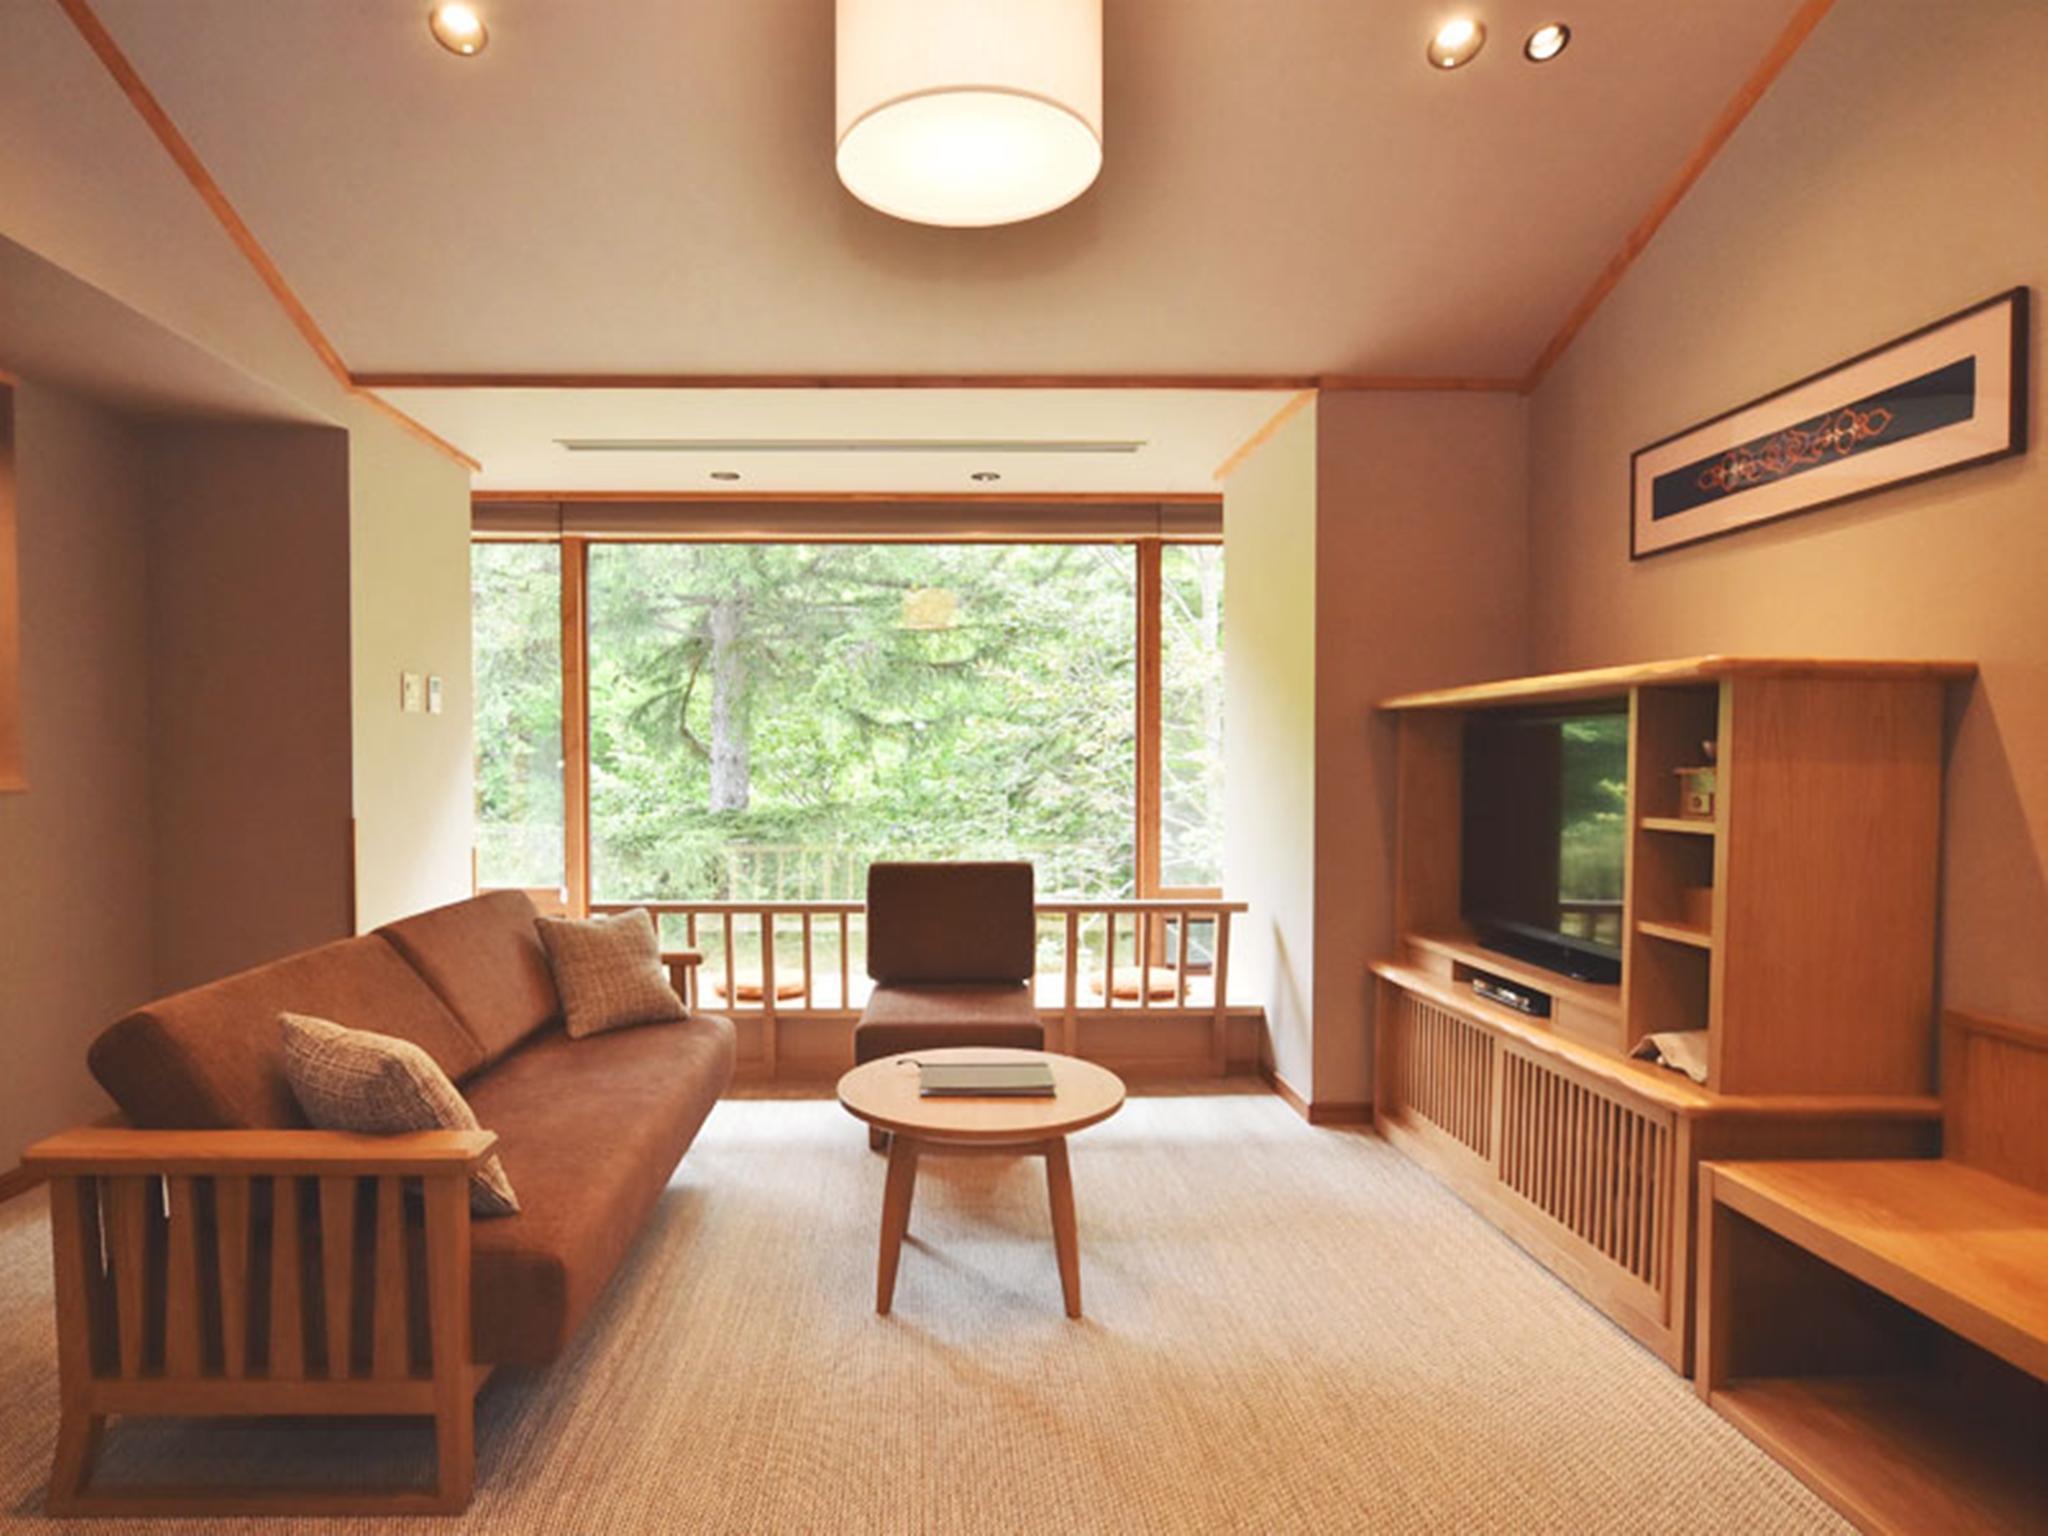 Hotel Kamuinoyu La Vista Akangawa In Japan